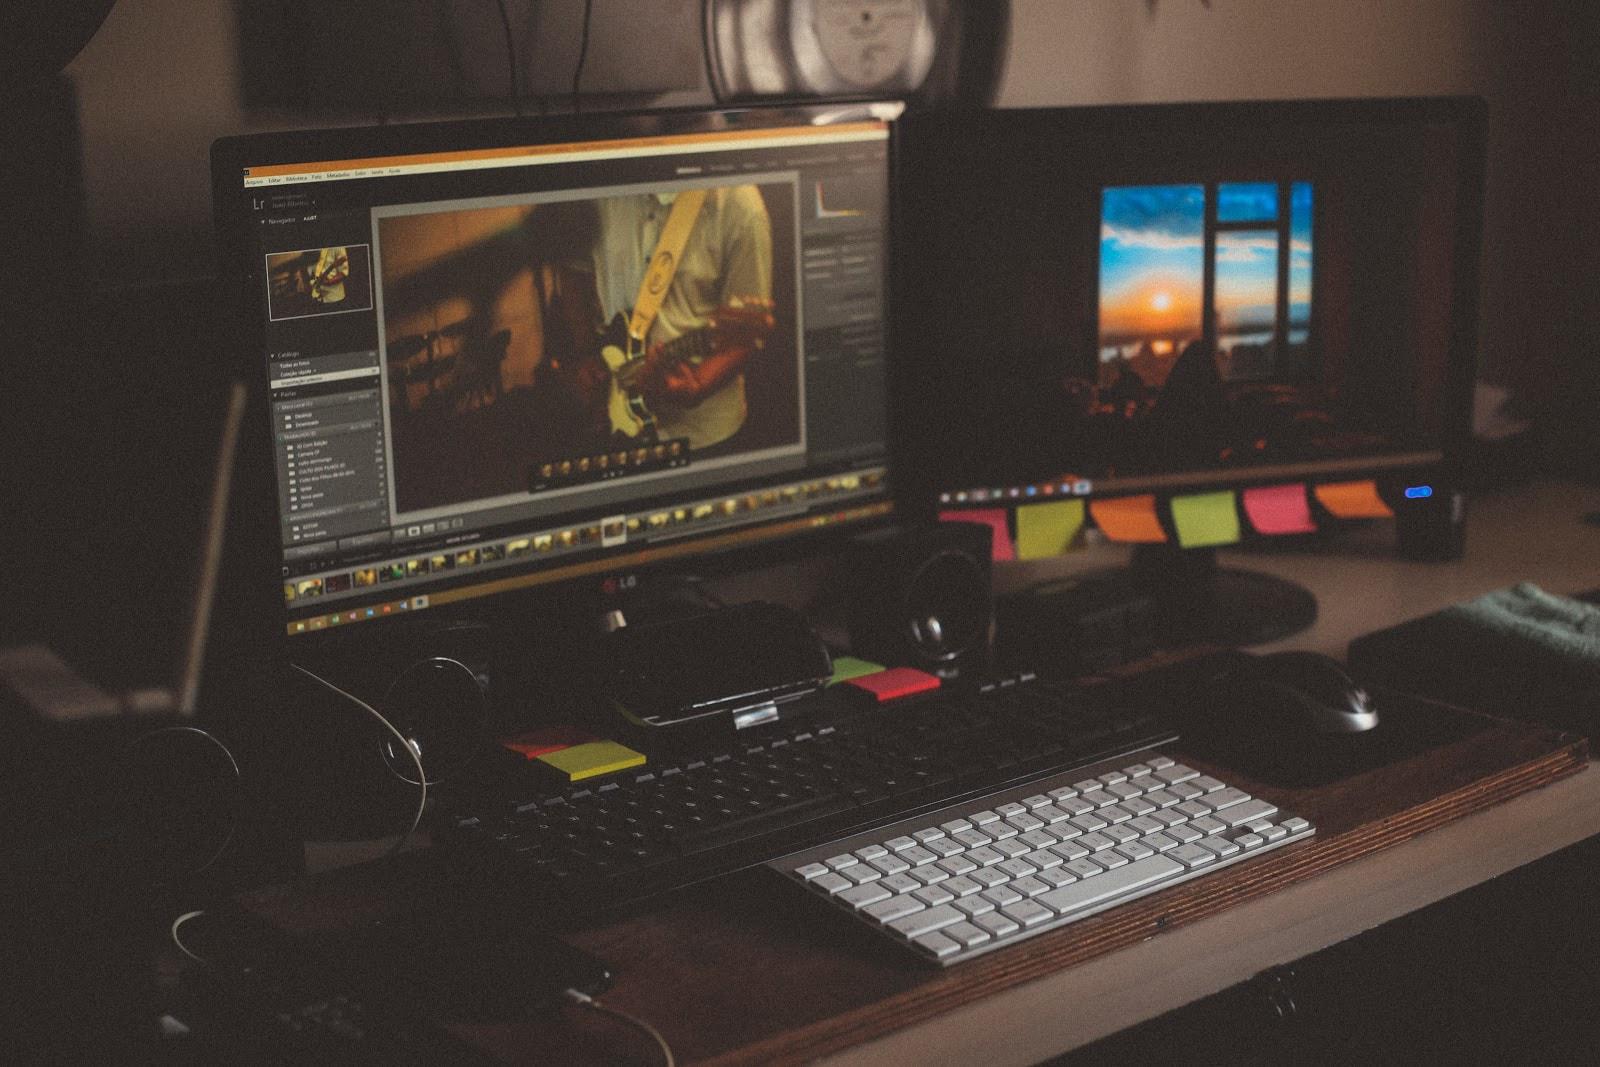 Computer image editing